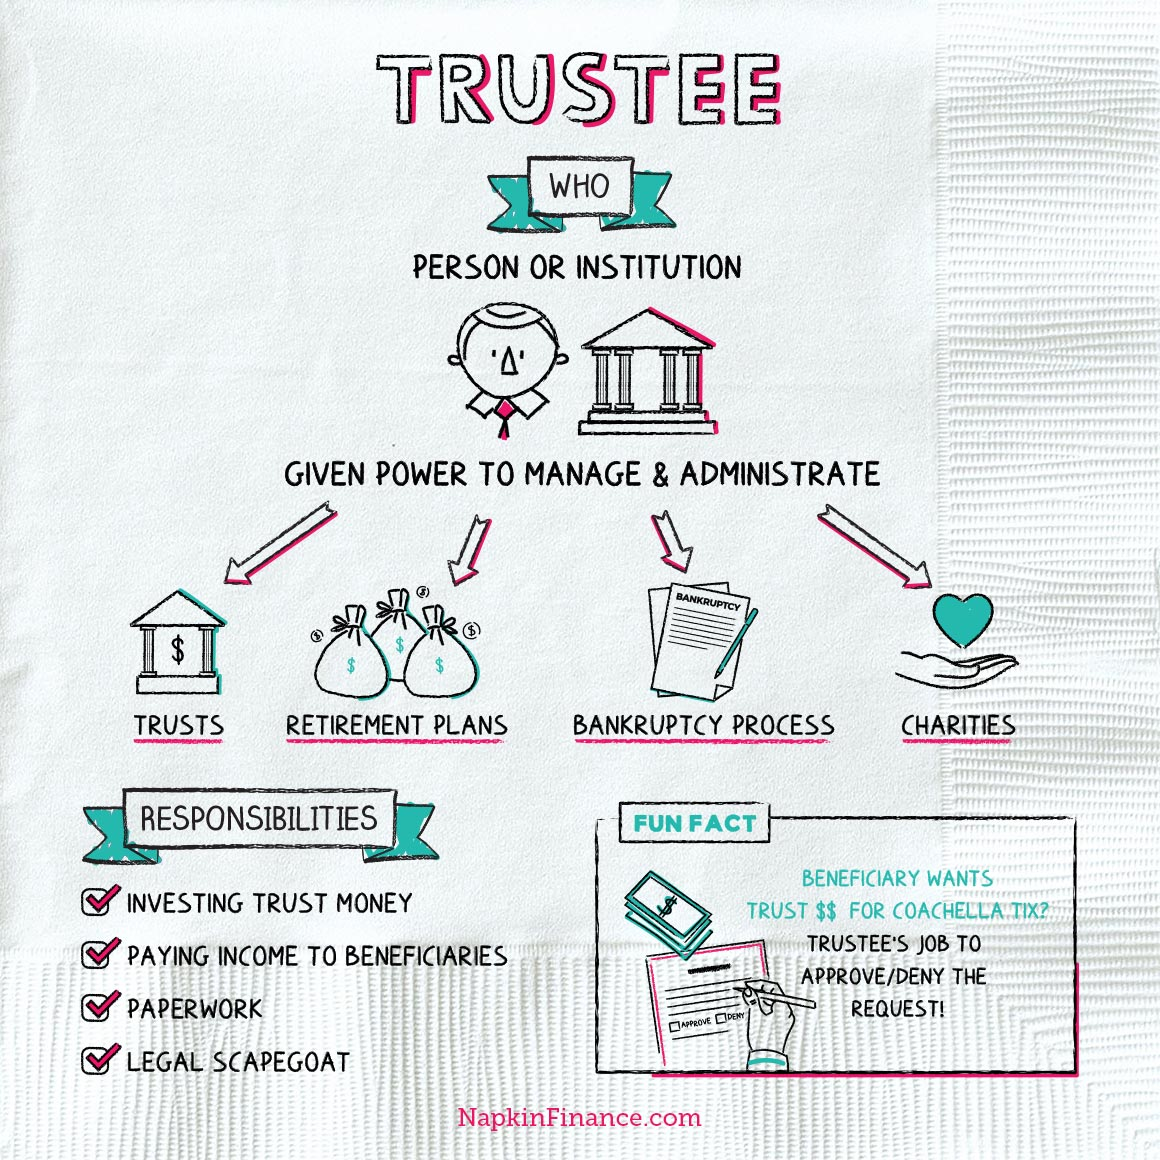 NapkinFinance-Trustee-Napkin-05-14-19-v05